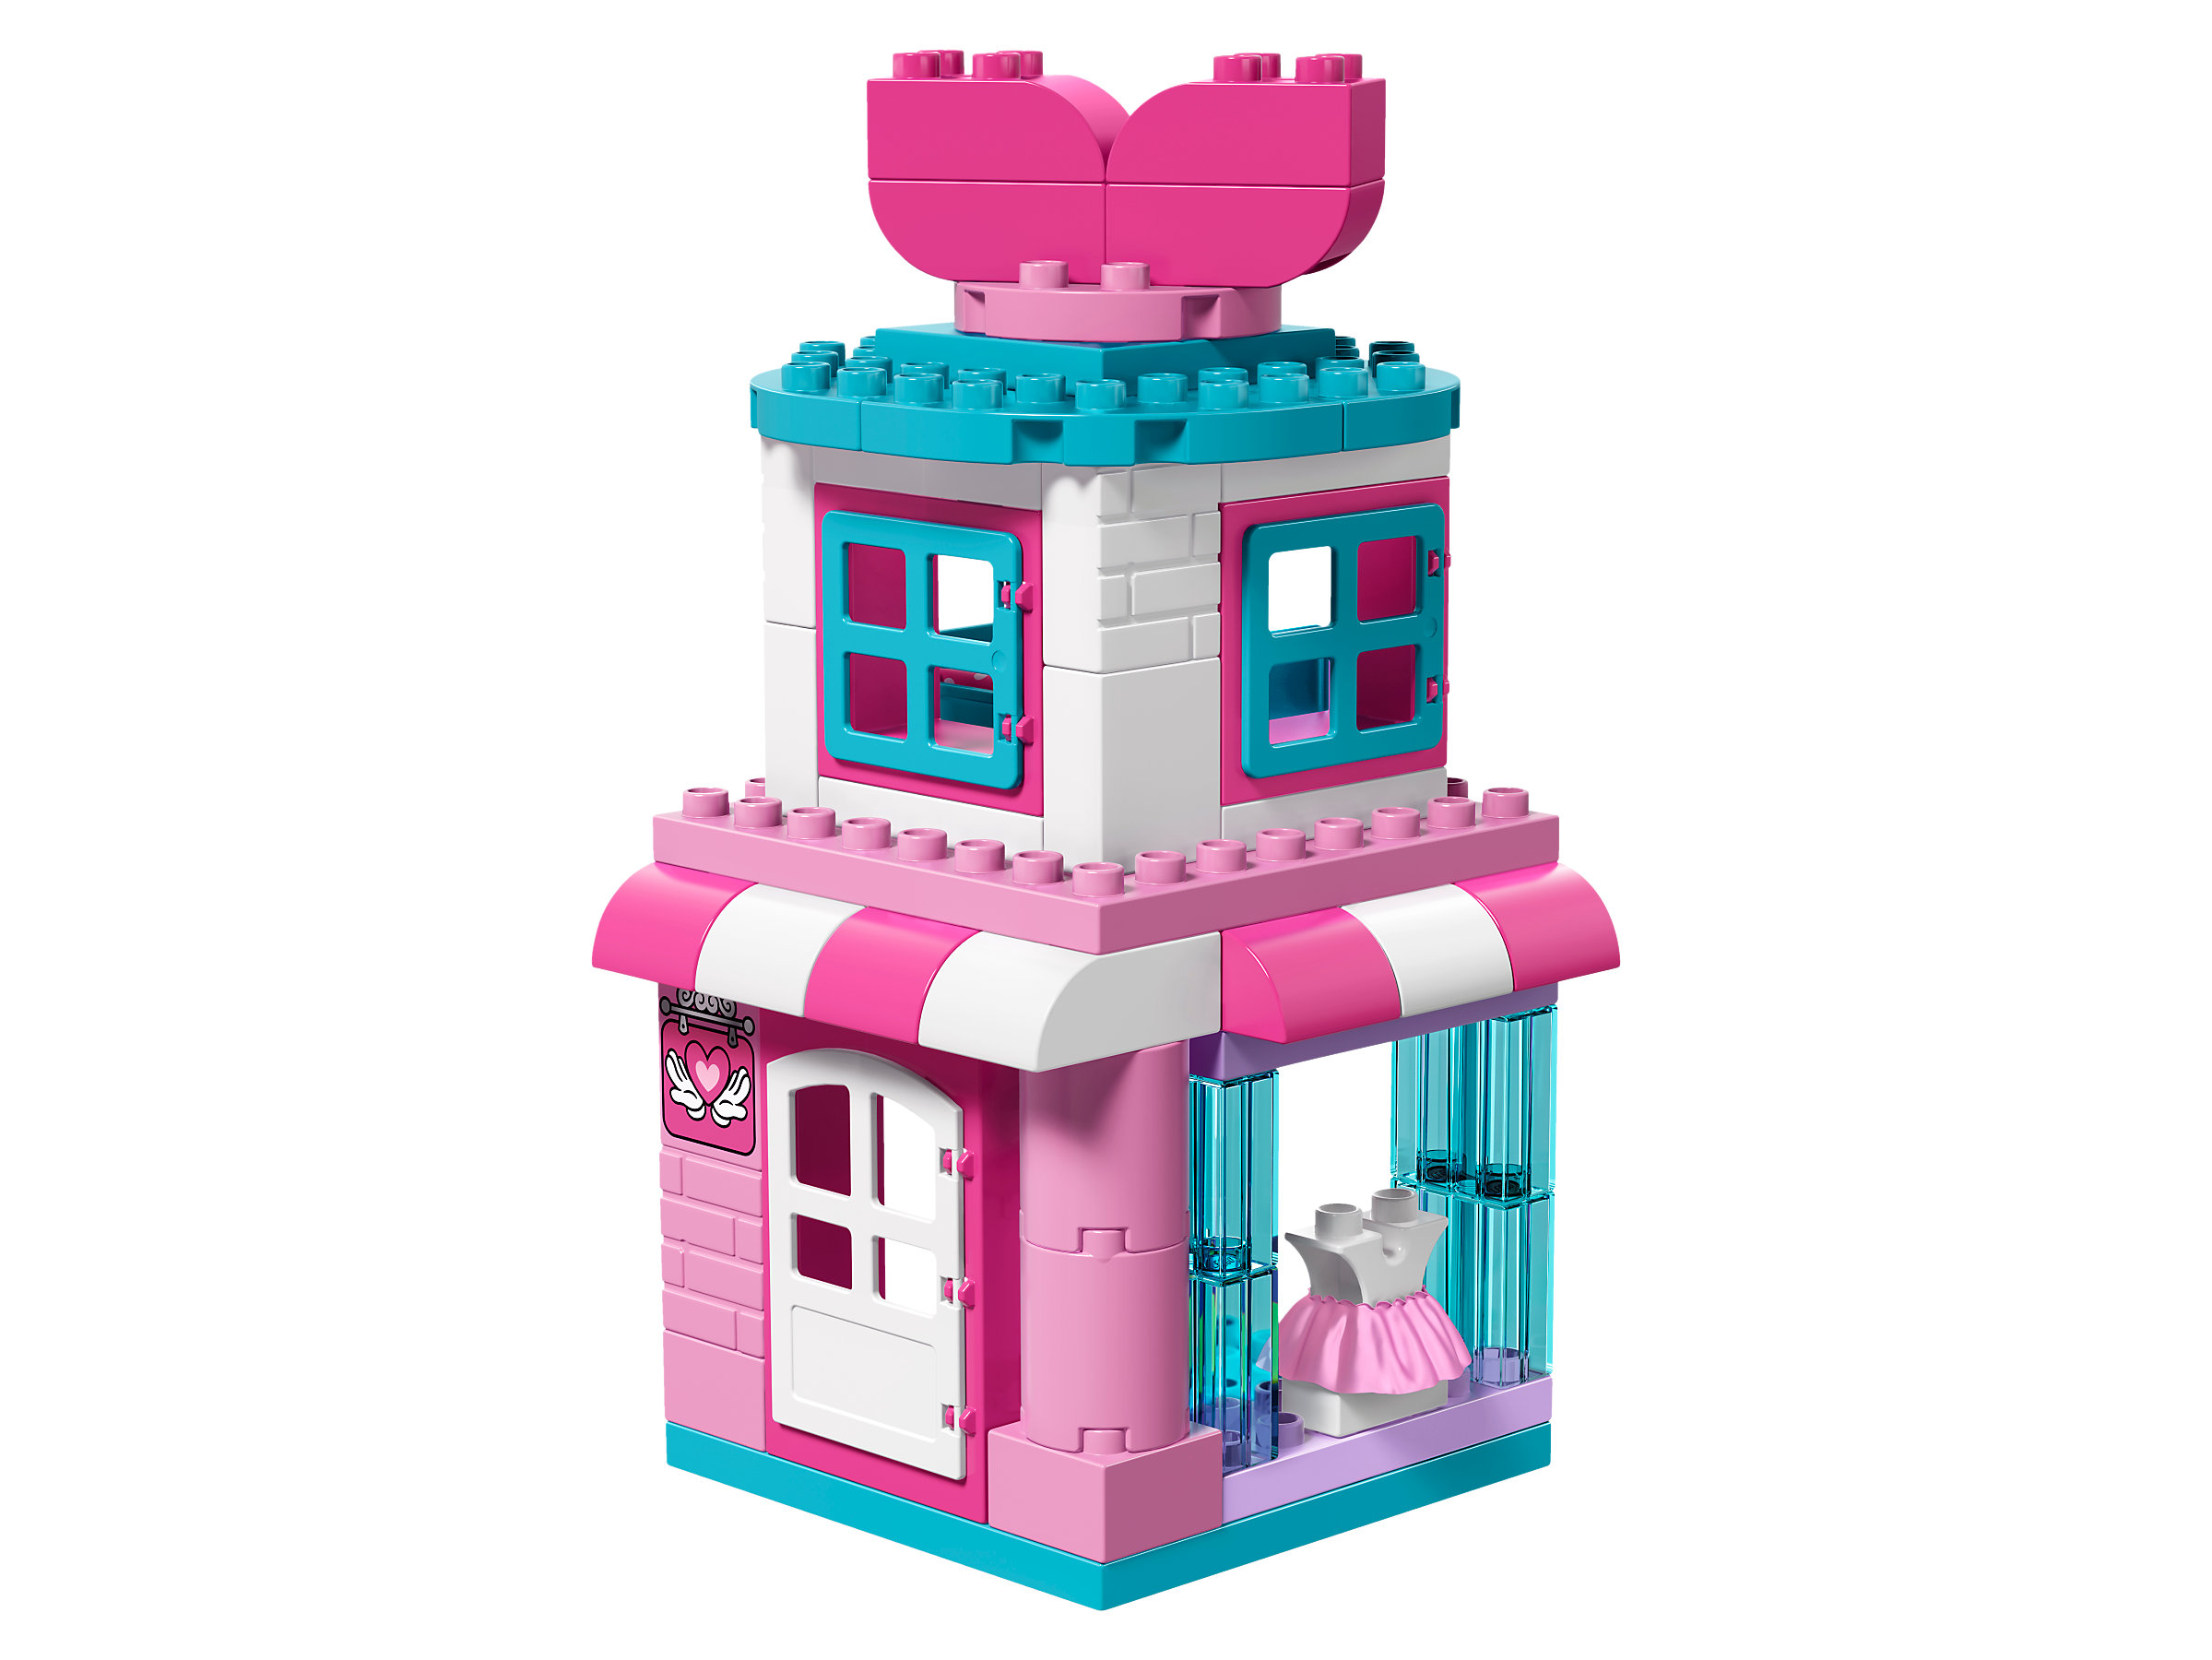 10844 MINNIE MOUSE BOW-TIQUE LEGO duplo NEW set legos DUPLOS disney juniors